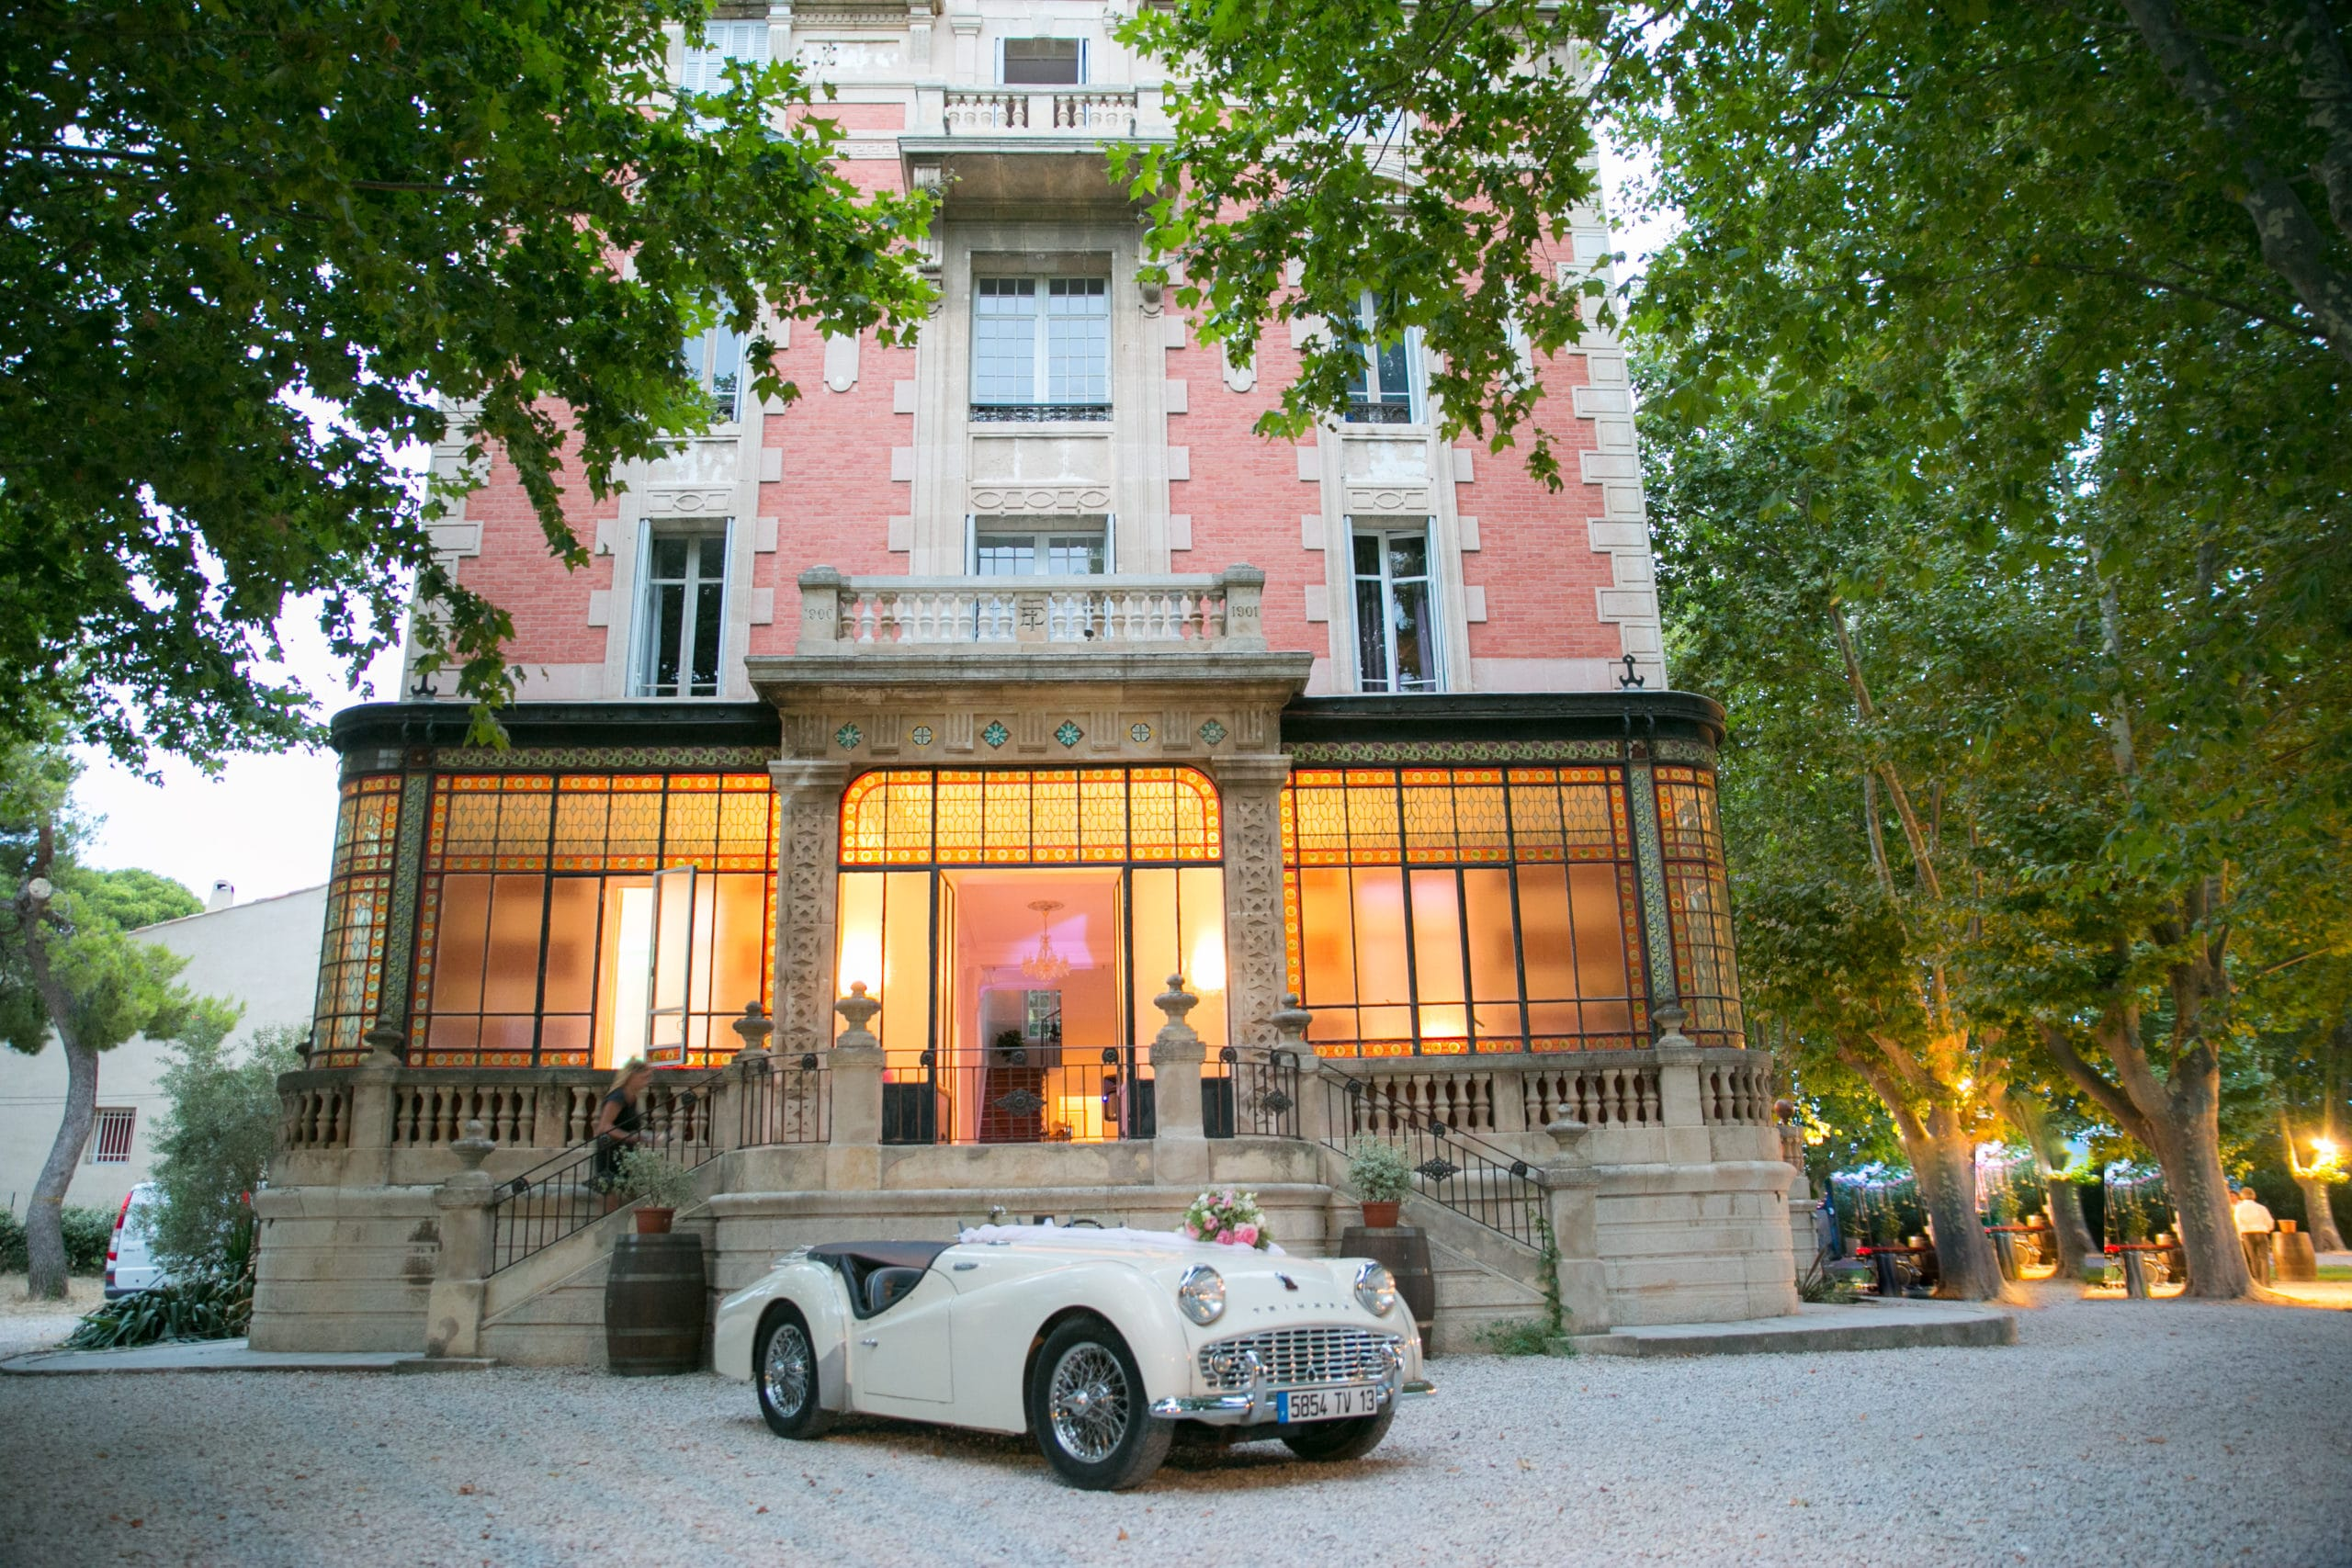 chateau-mariage-provence-salle-reception-lieu-reception-marseille-aix-salon-lancon